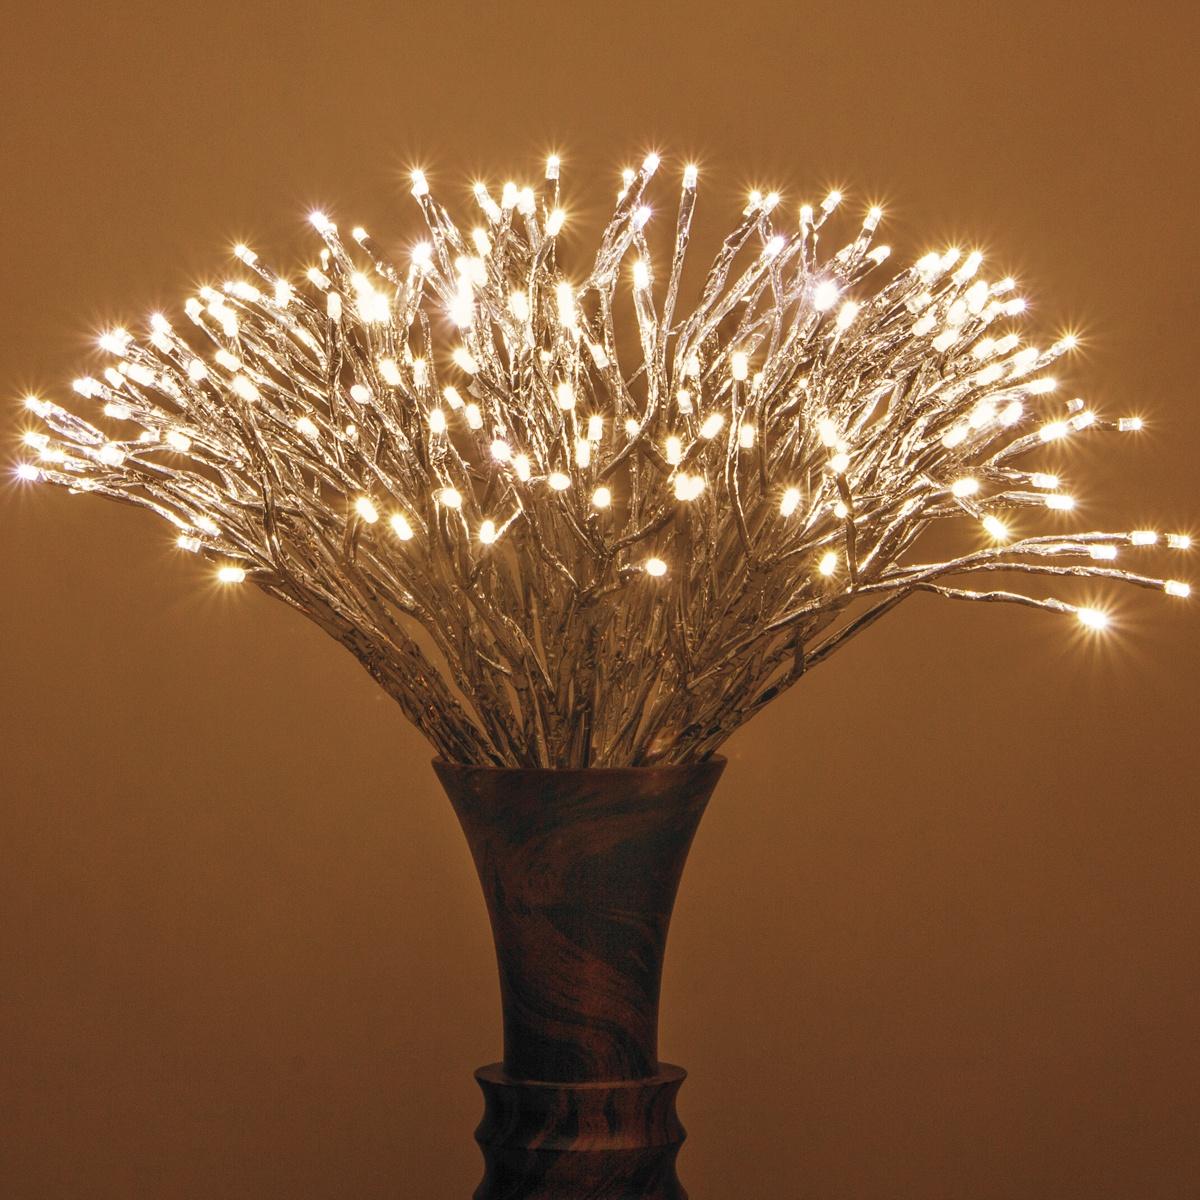 Starburst Lighted Branches